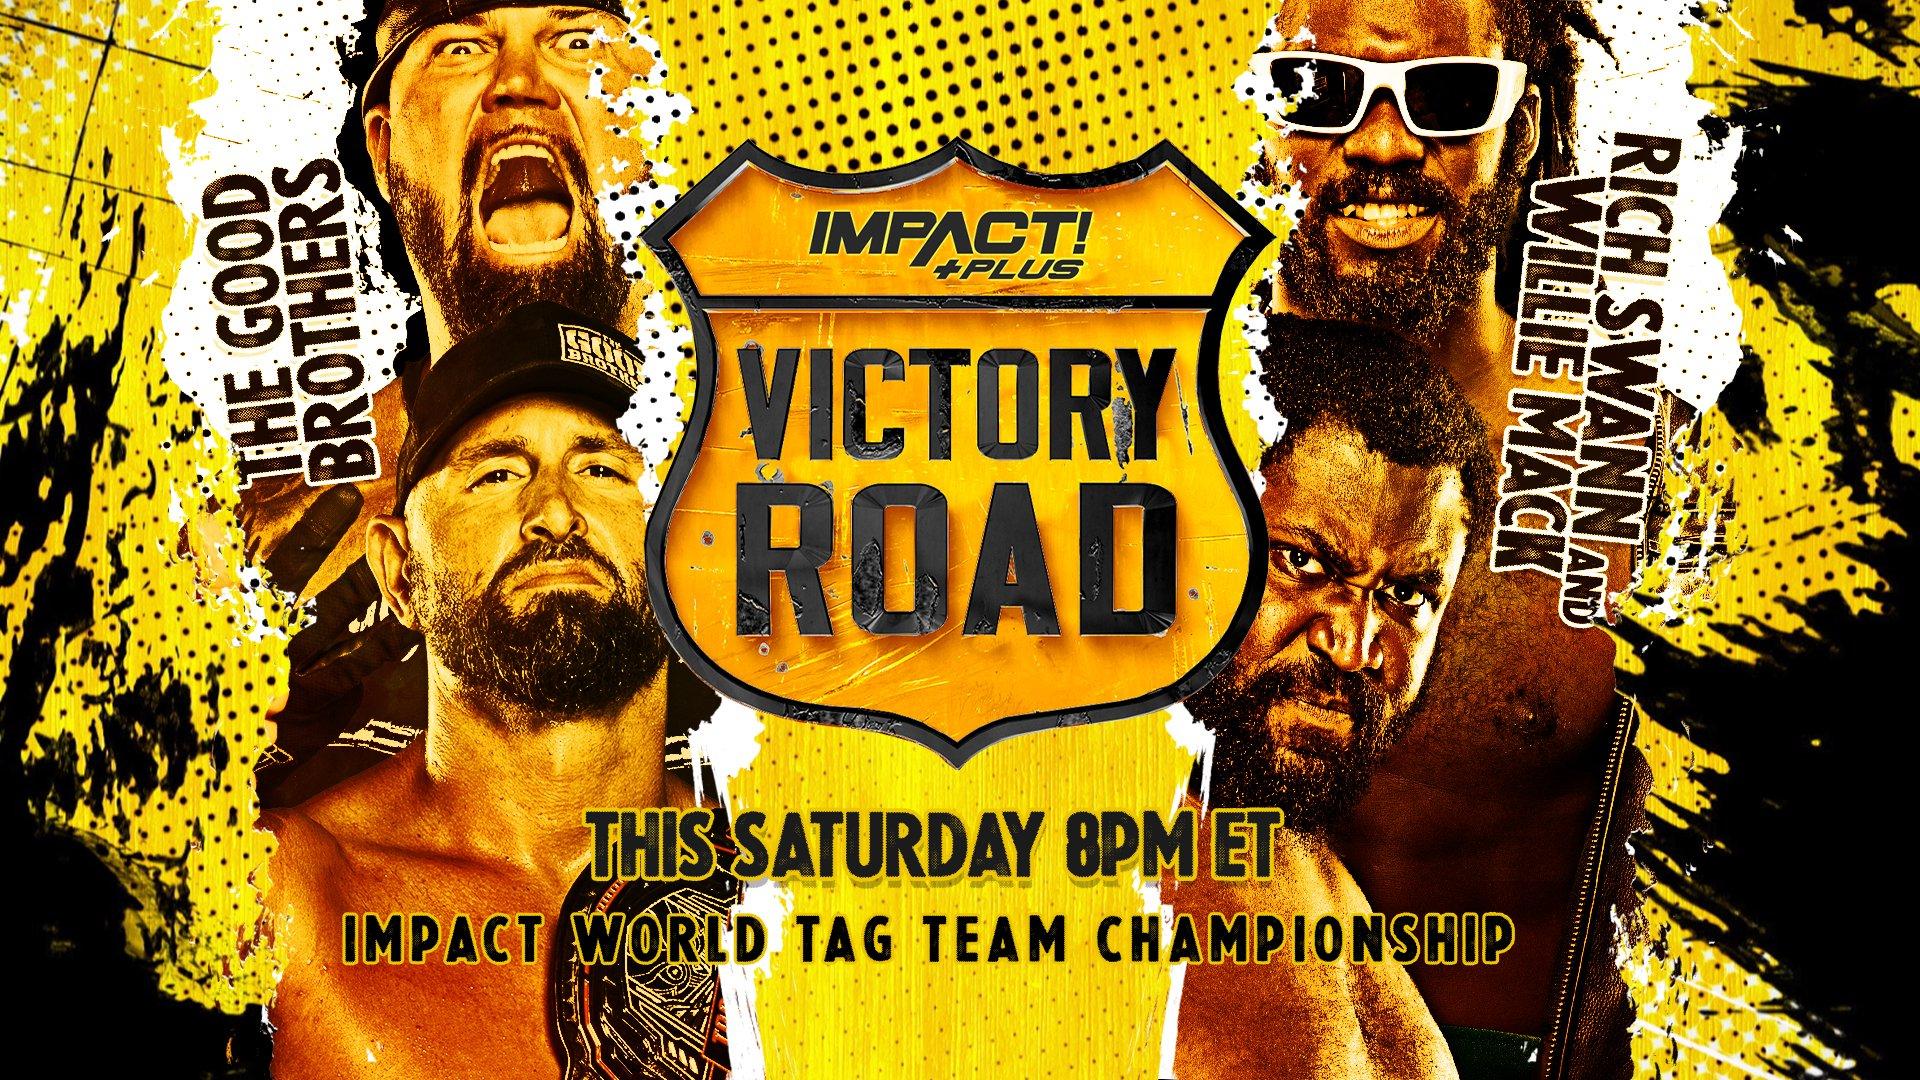 Impact World tag team championship